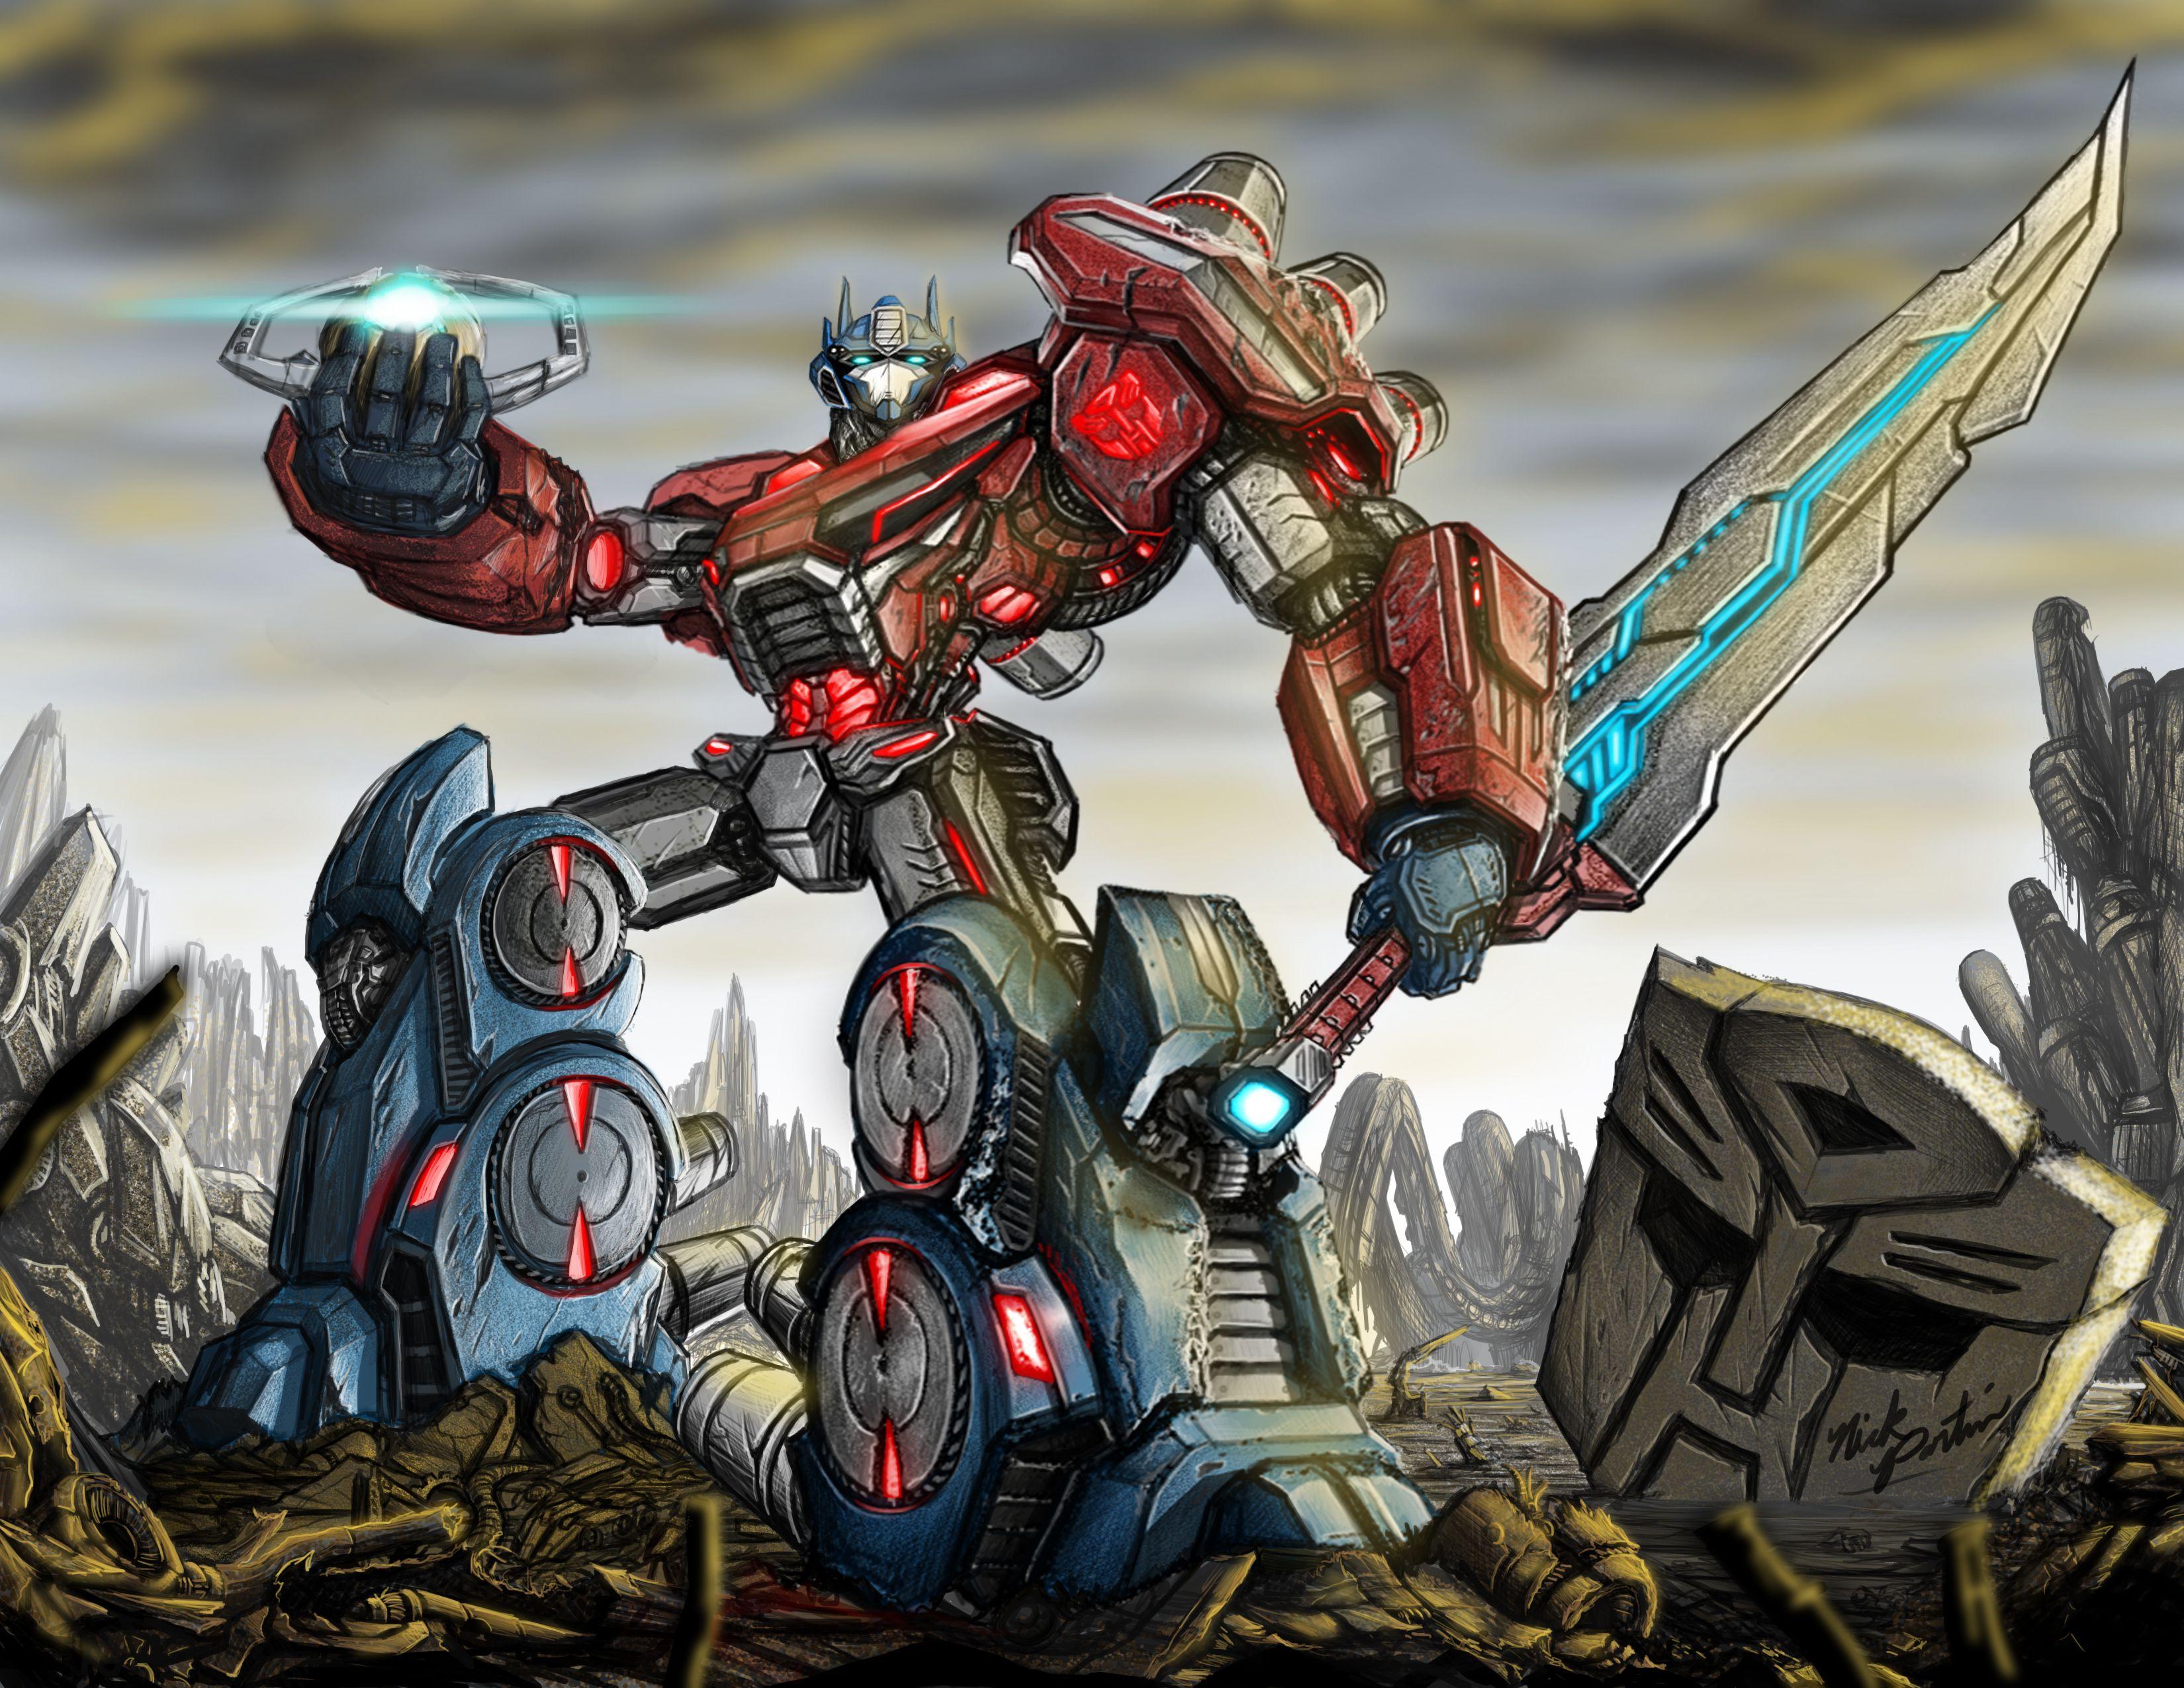 Transformers - Fall Of Cybertron Fan Art Partin-arts